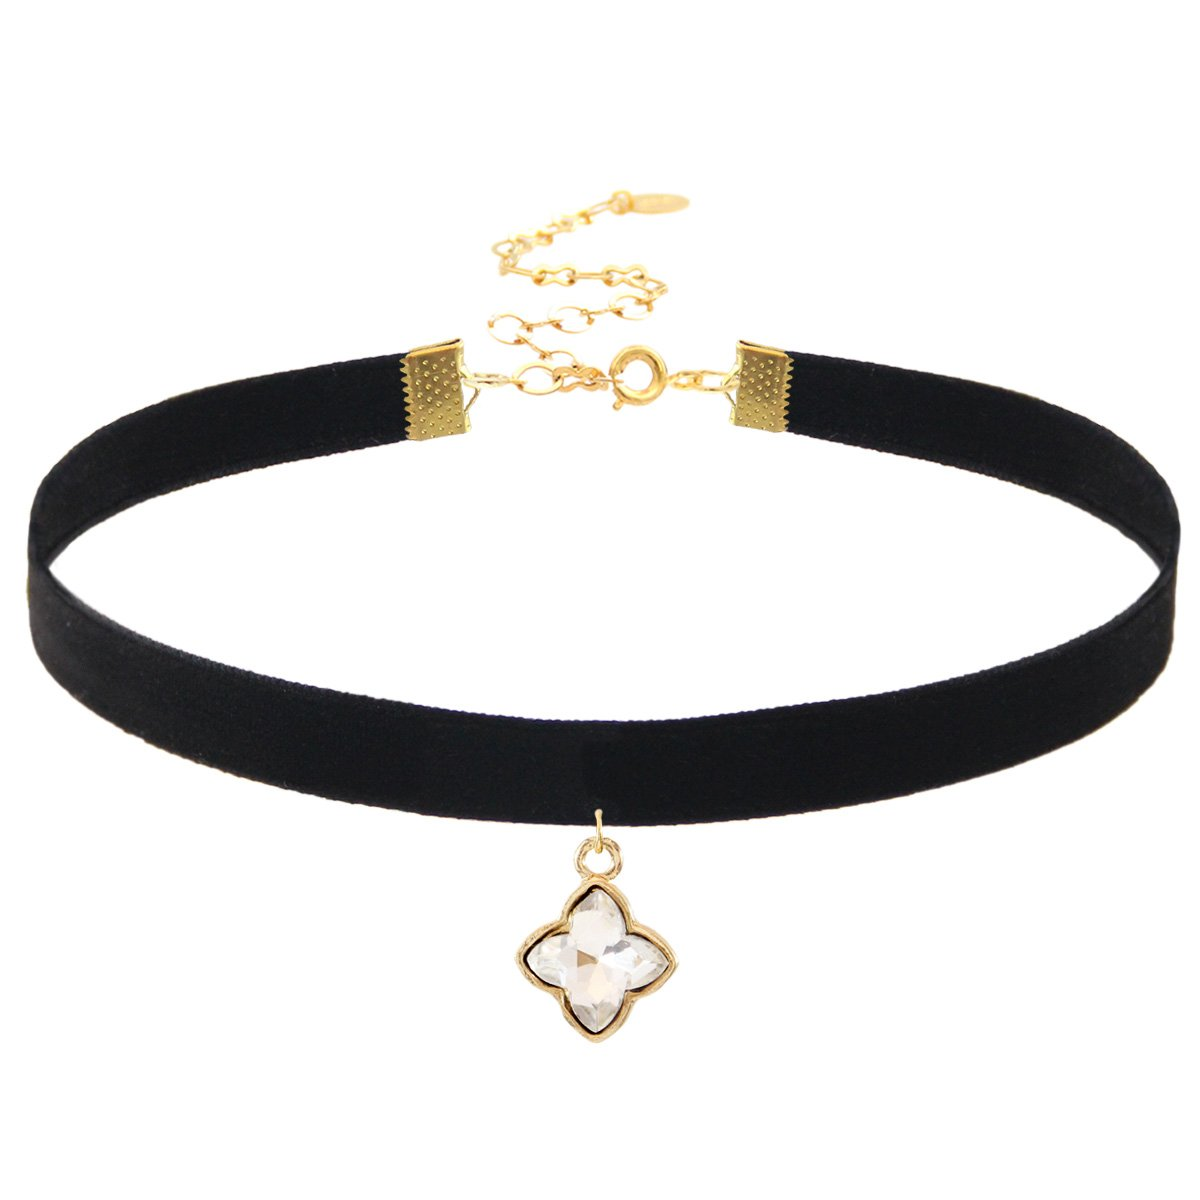 18K Gold Plated Closure.Length: 11 with 4 extender Width: 10mm Choker Necklace Clover Pendant on Black Velvet Ribbon Choker Pendant Size: 12x20 mm.